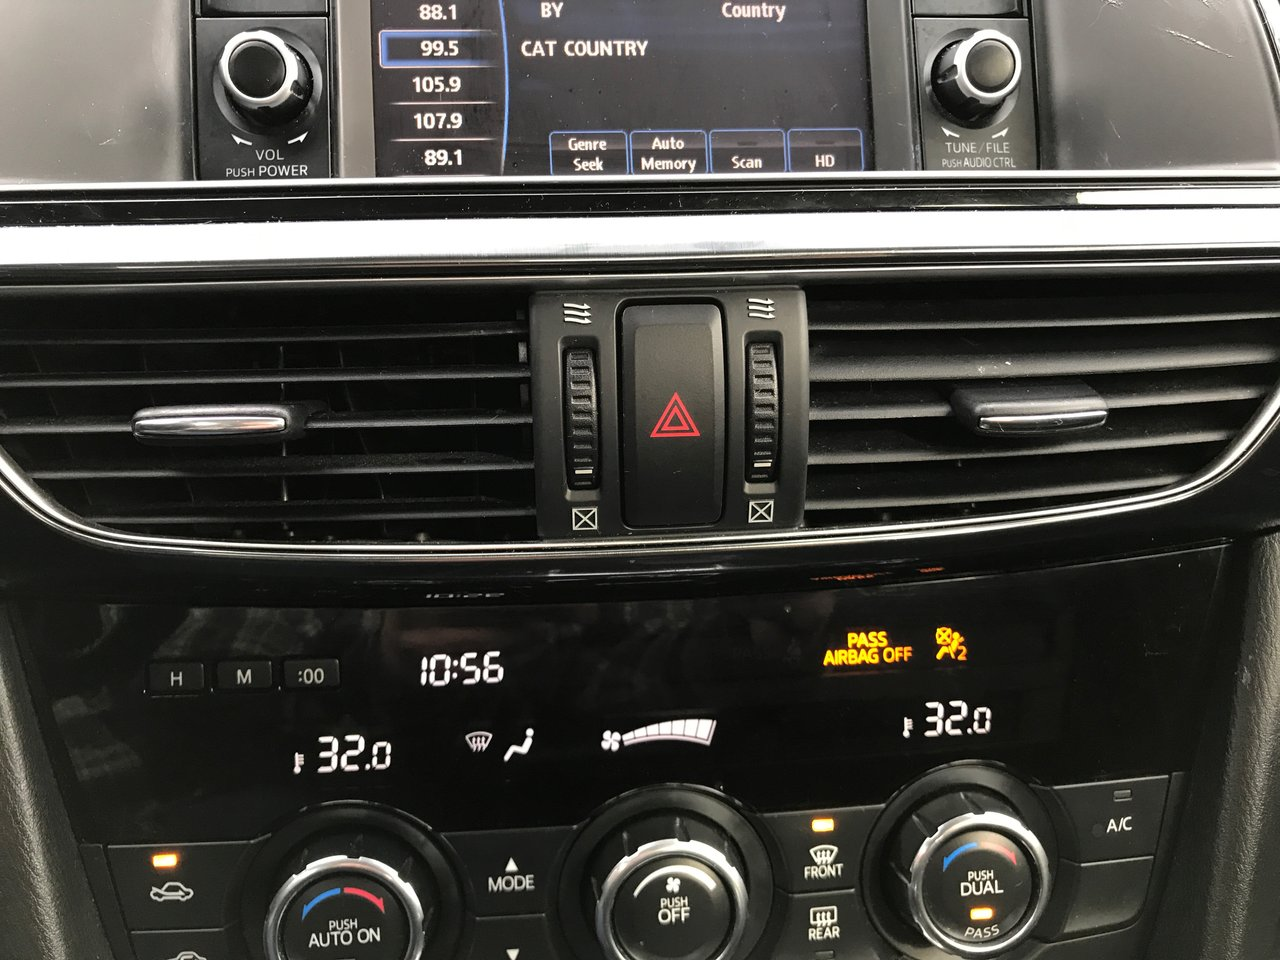 Photo 2015 Mazda Mazda6 0.9% FINANCING! MAZDA WARRANTY! HEATED SEATS! 0.9% FINANCING! MAZDA WARRANTY! HEATED SEATS!